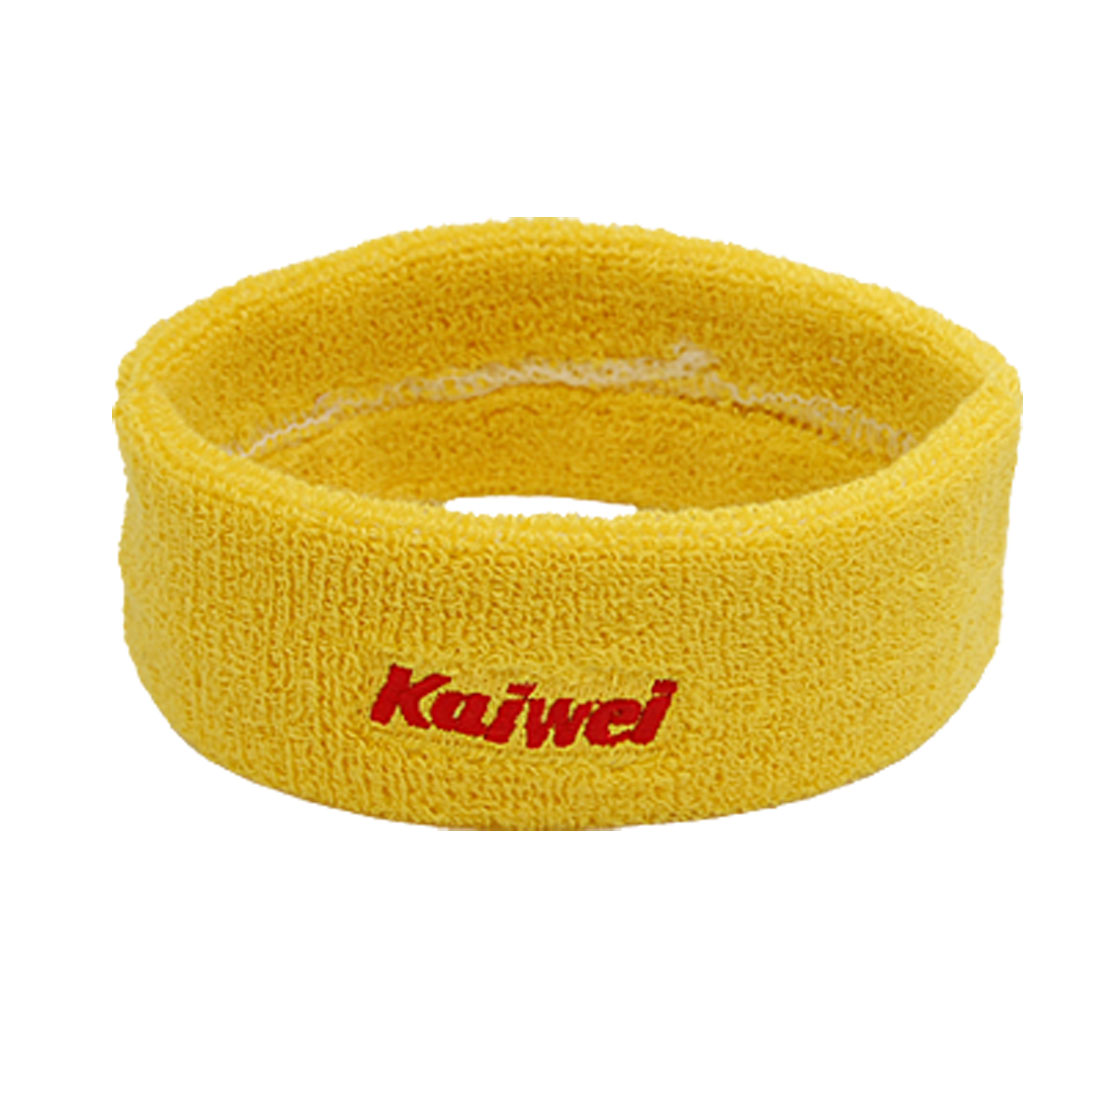 Sports Athletic Elastic Sweat Head Band Headband Yellow